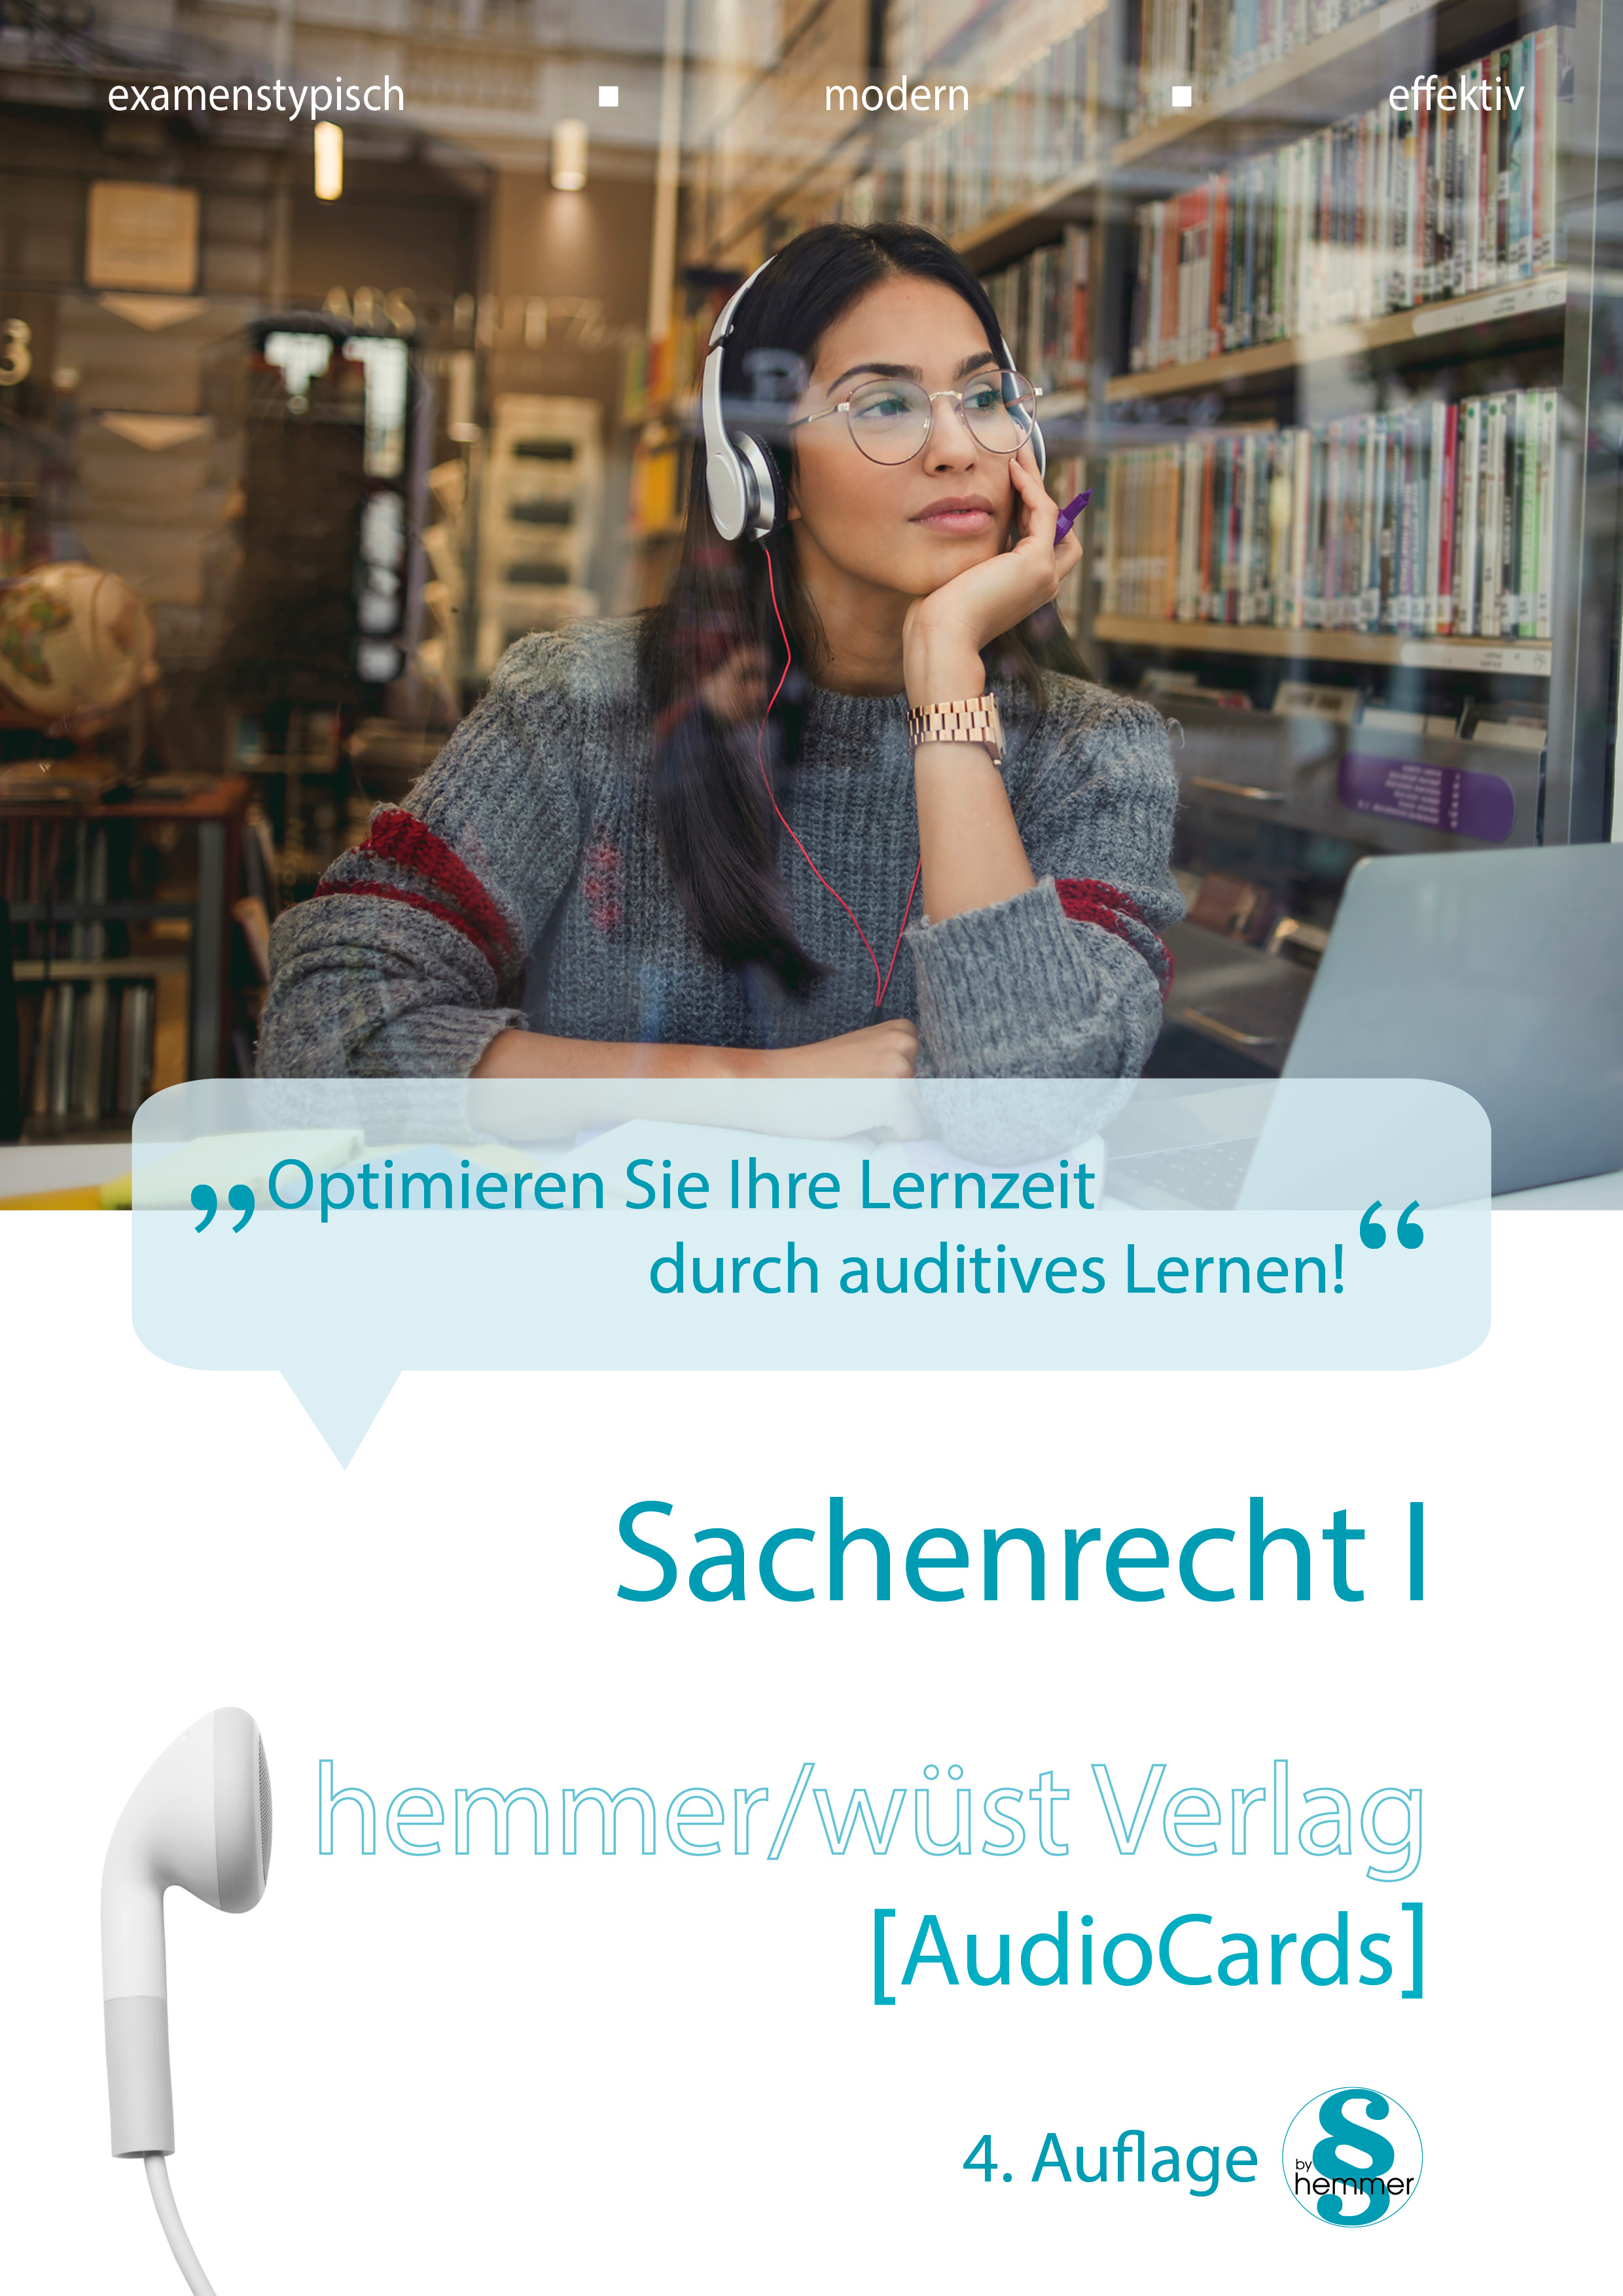 Audiocards - Sachenrecht I - Download